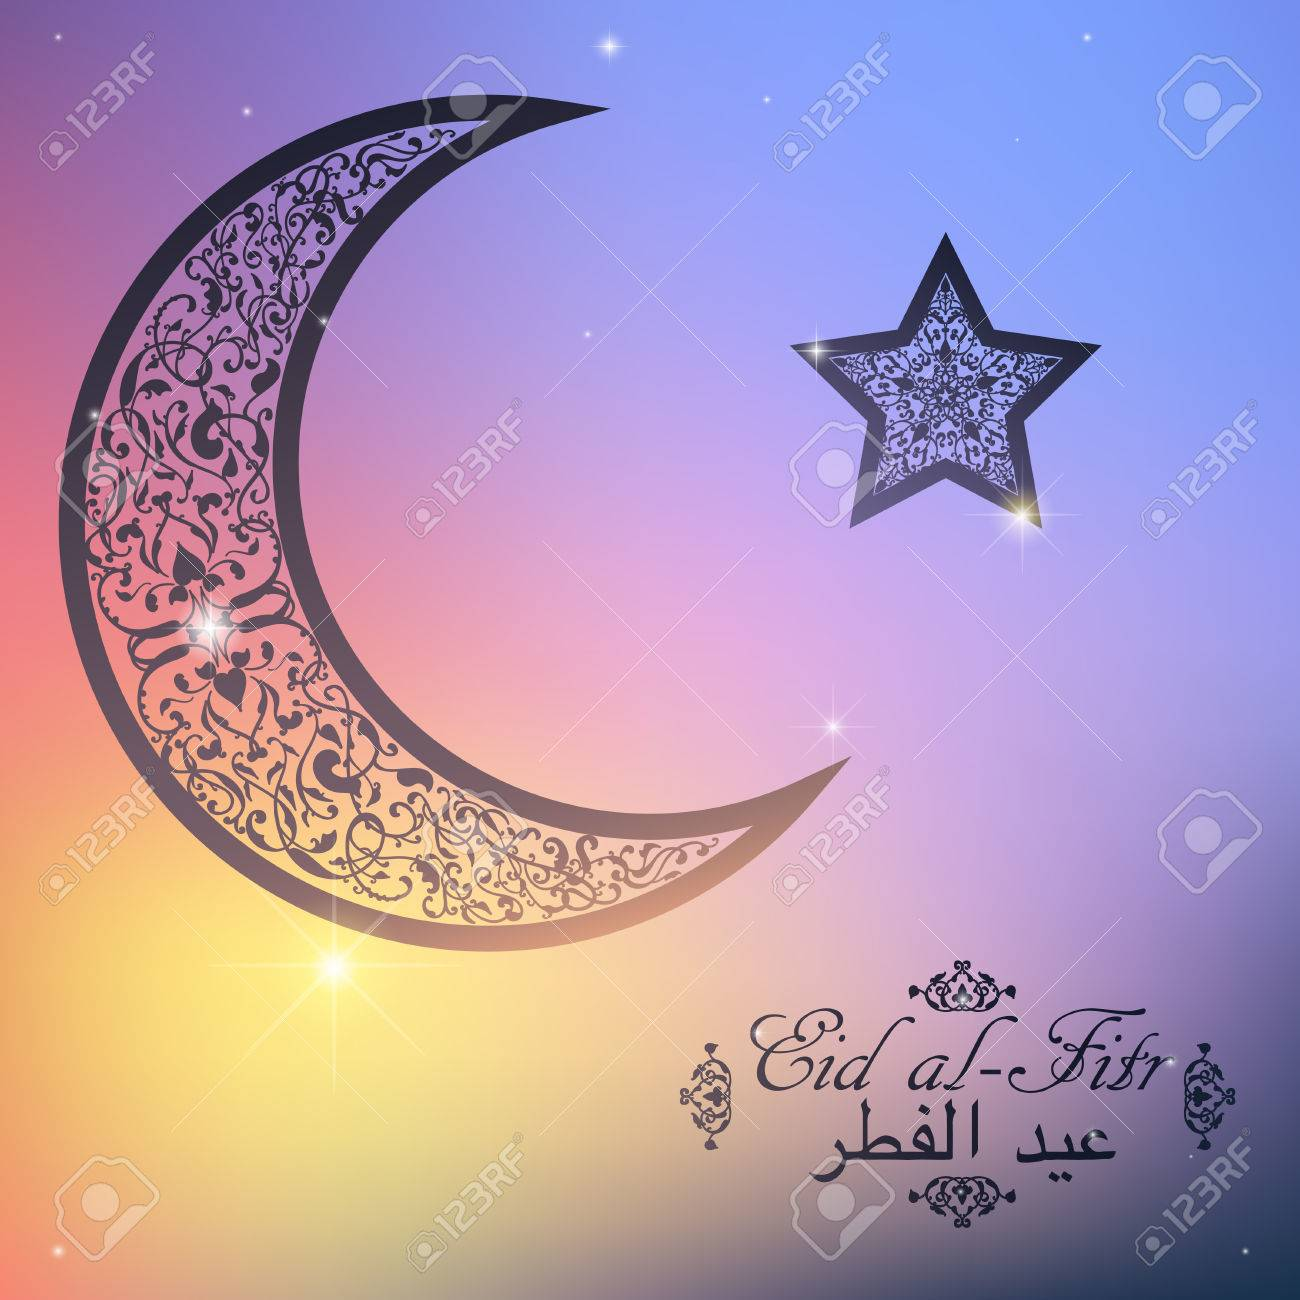 Top Hijri Eid Al-Fitr Greeting - 58734440-english-translate-eid-al-fitr-beautiful-crescent-and-star-on-blurred-background-islamic-celebration-  Snapshot_765684 .jpg